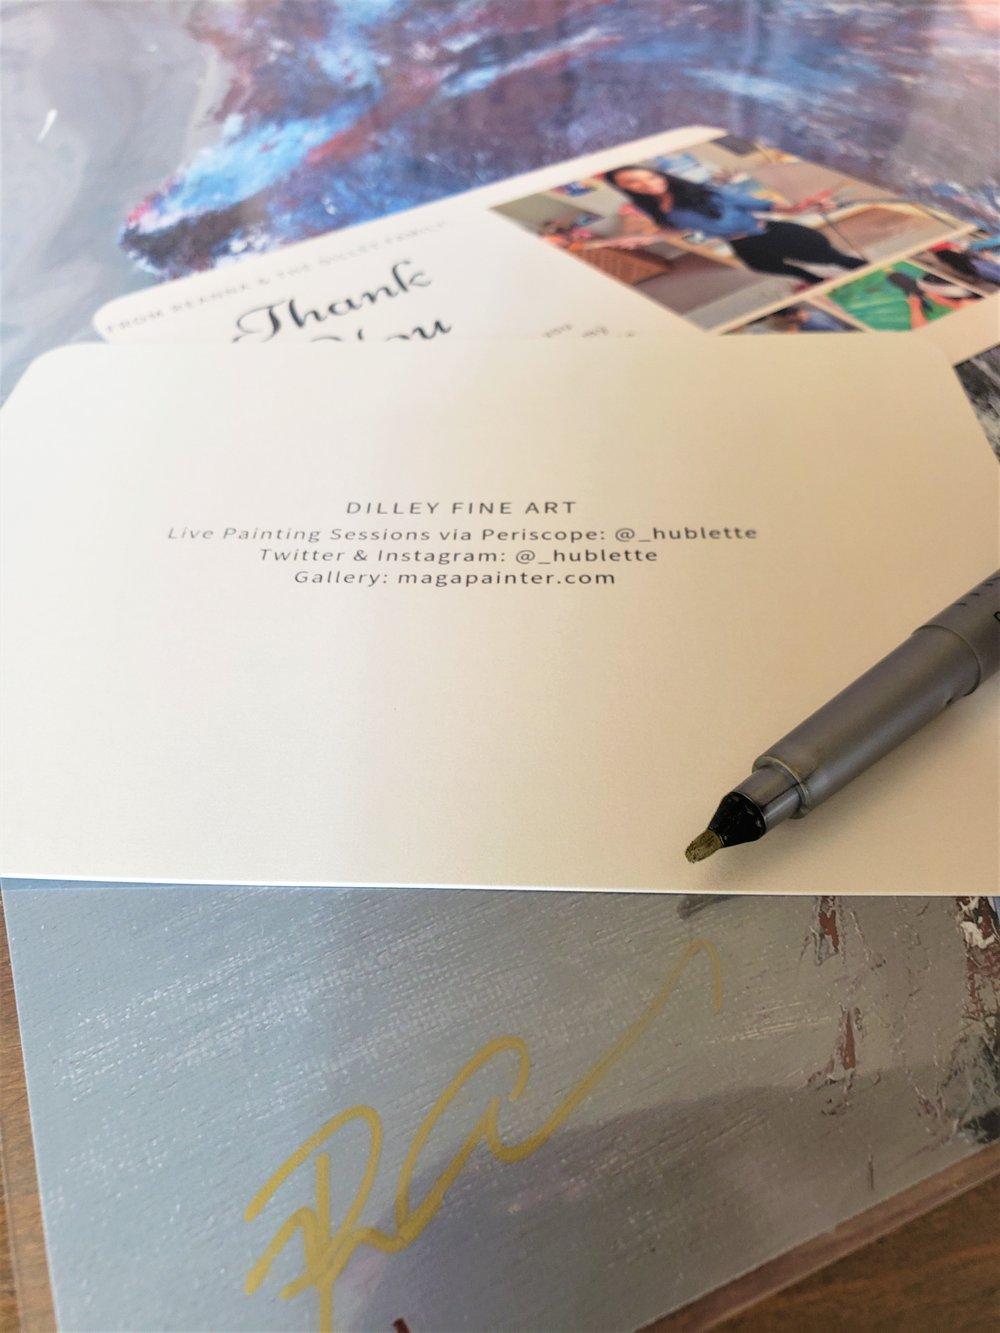 Image of Artist Signature on Merchandise